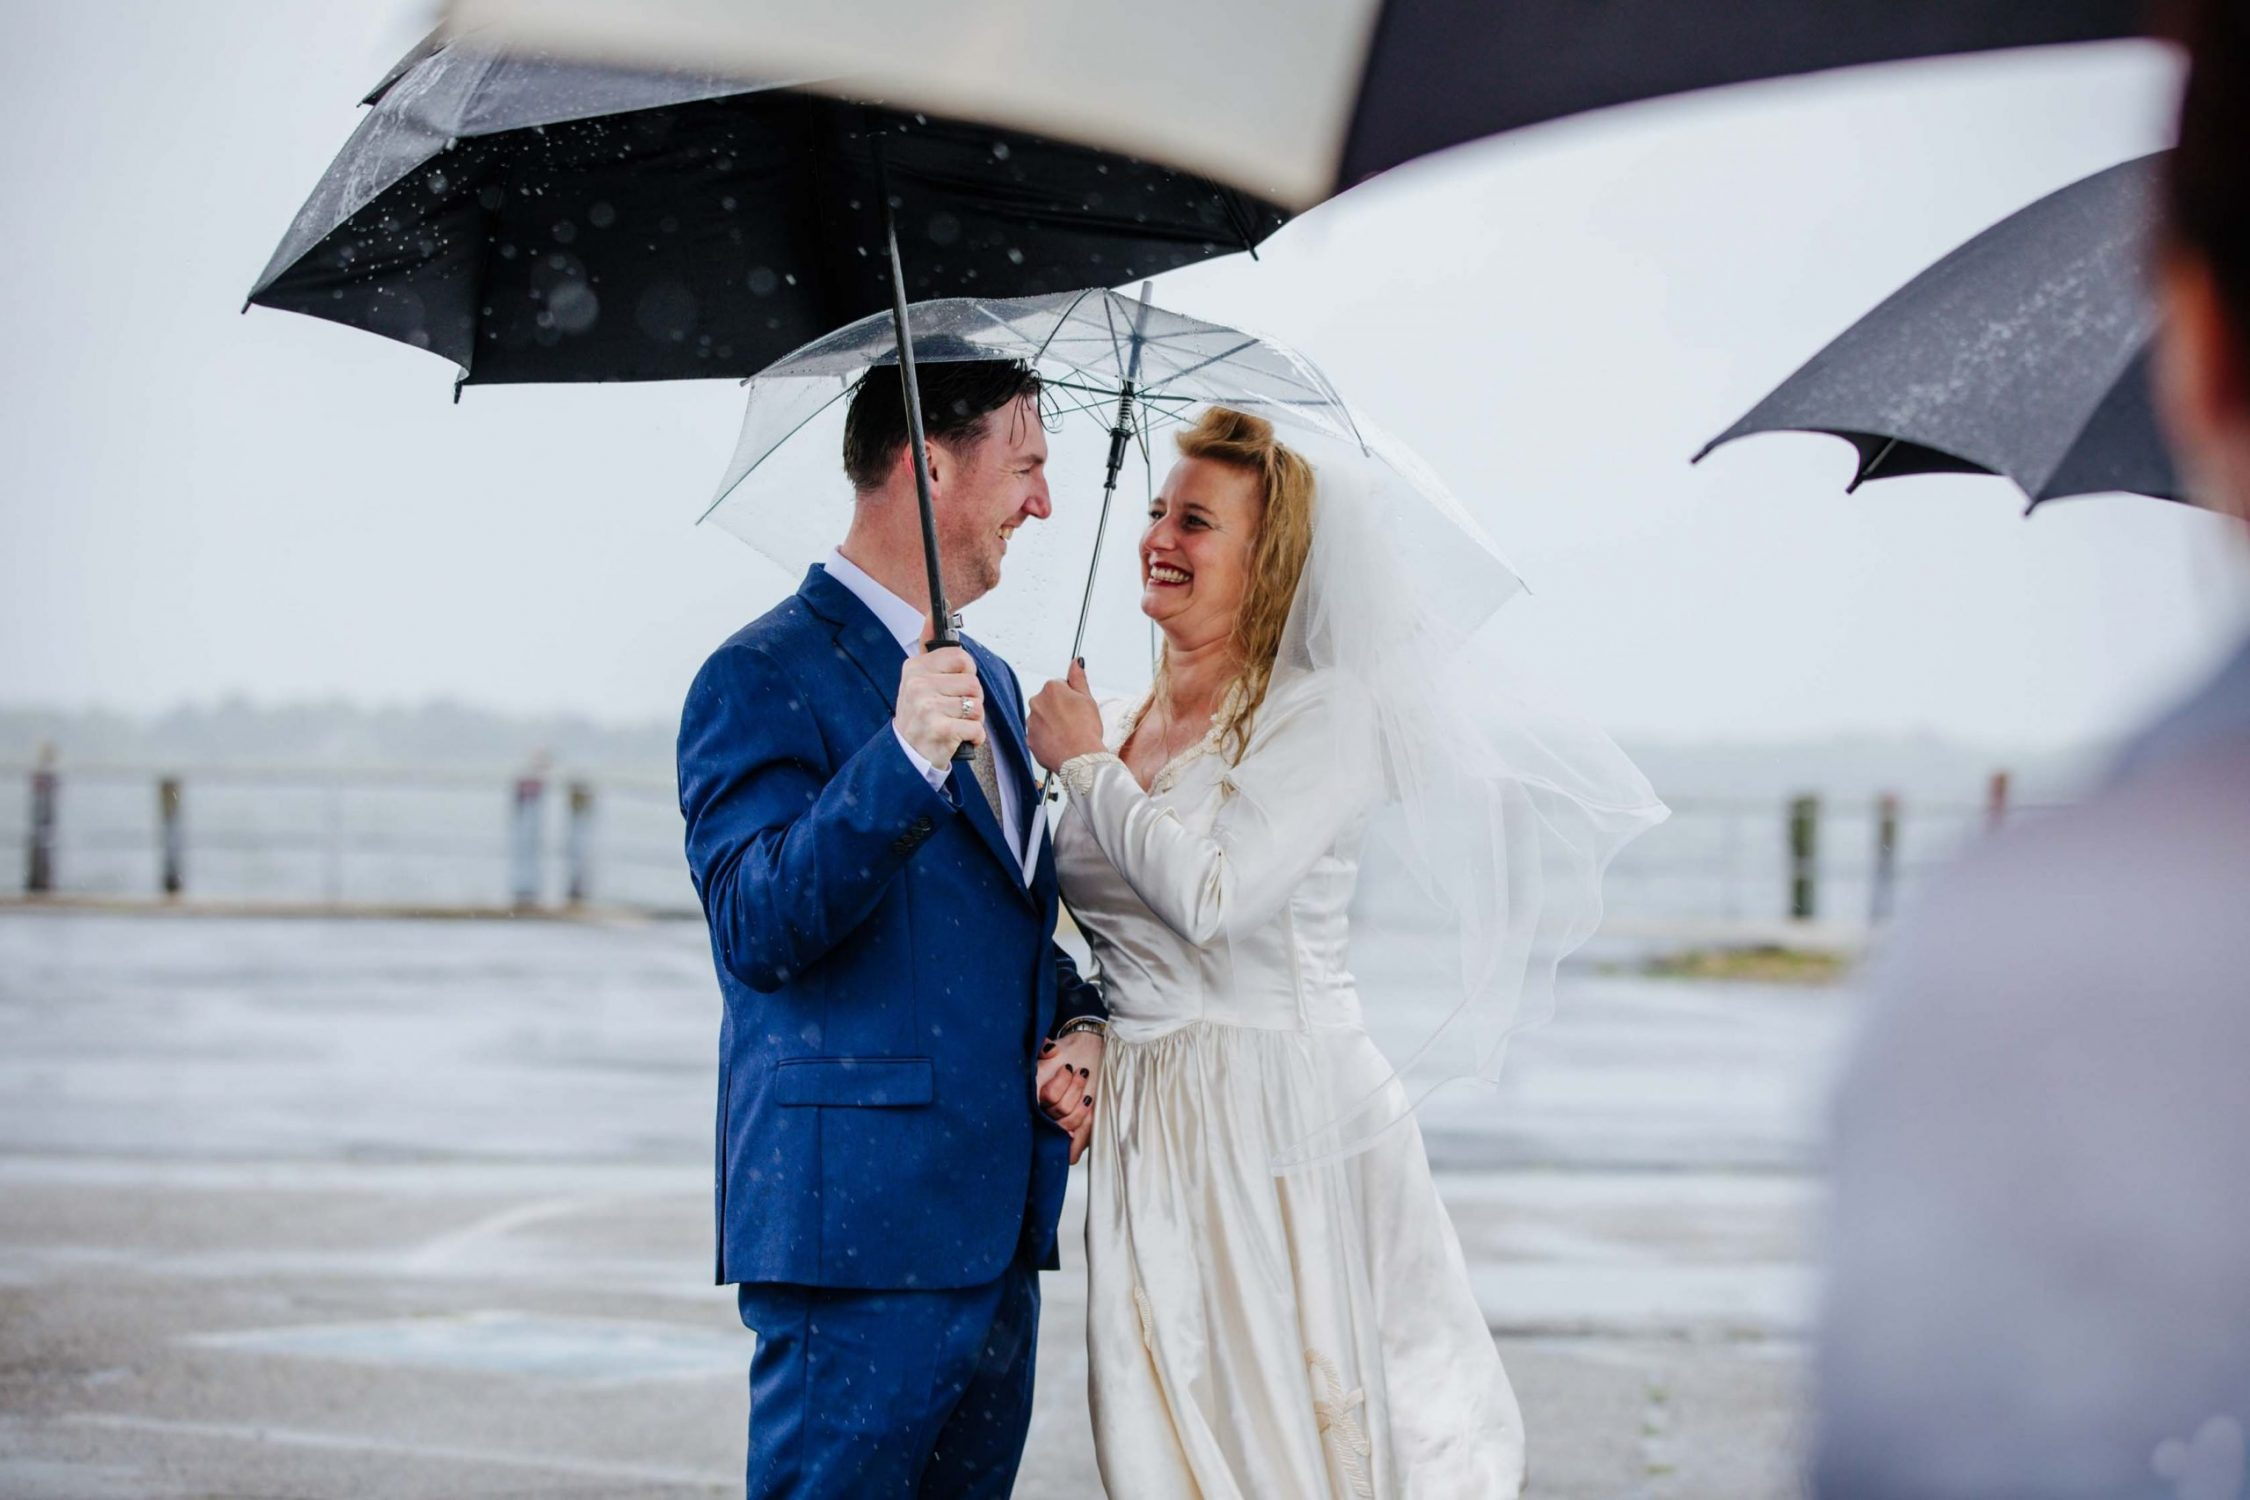 Couple married in rain